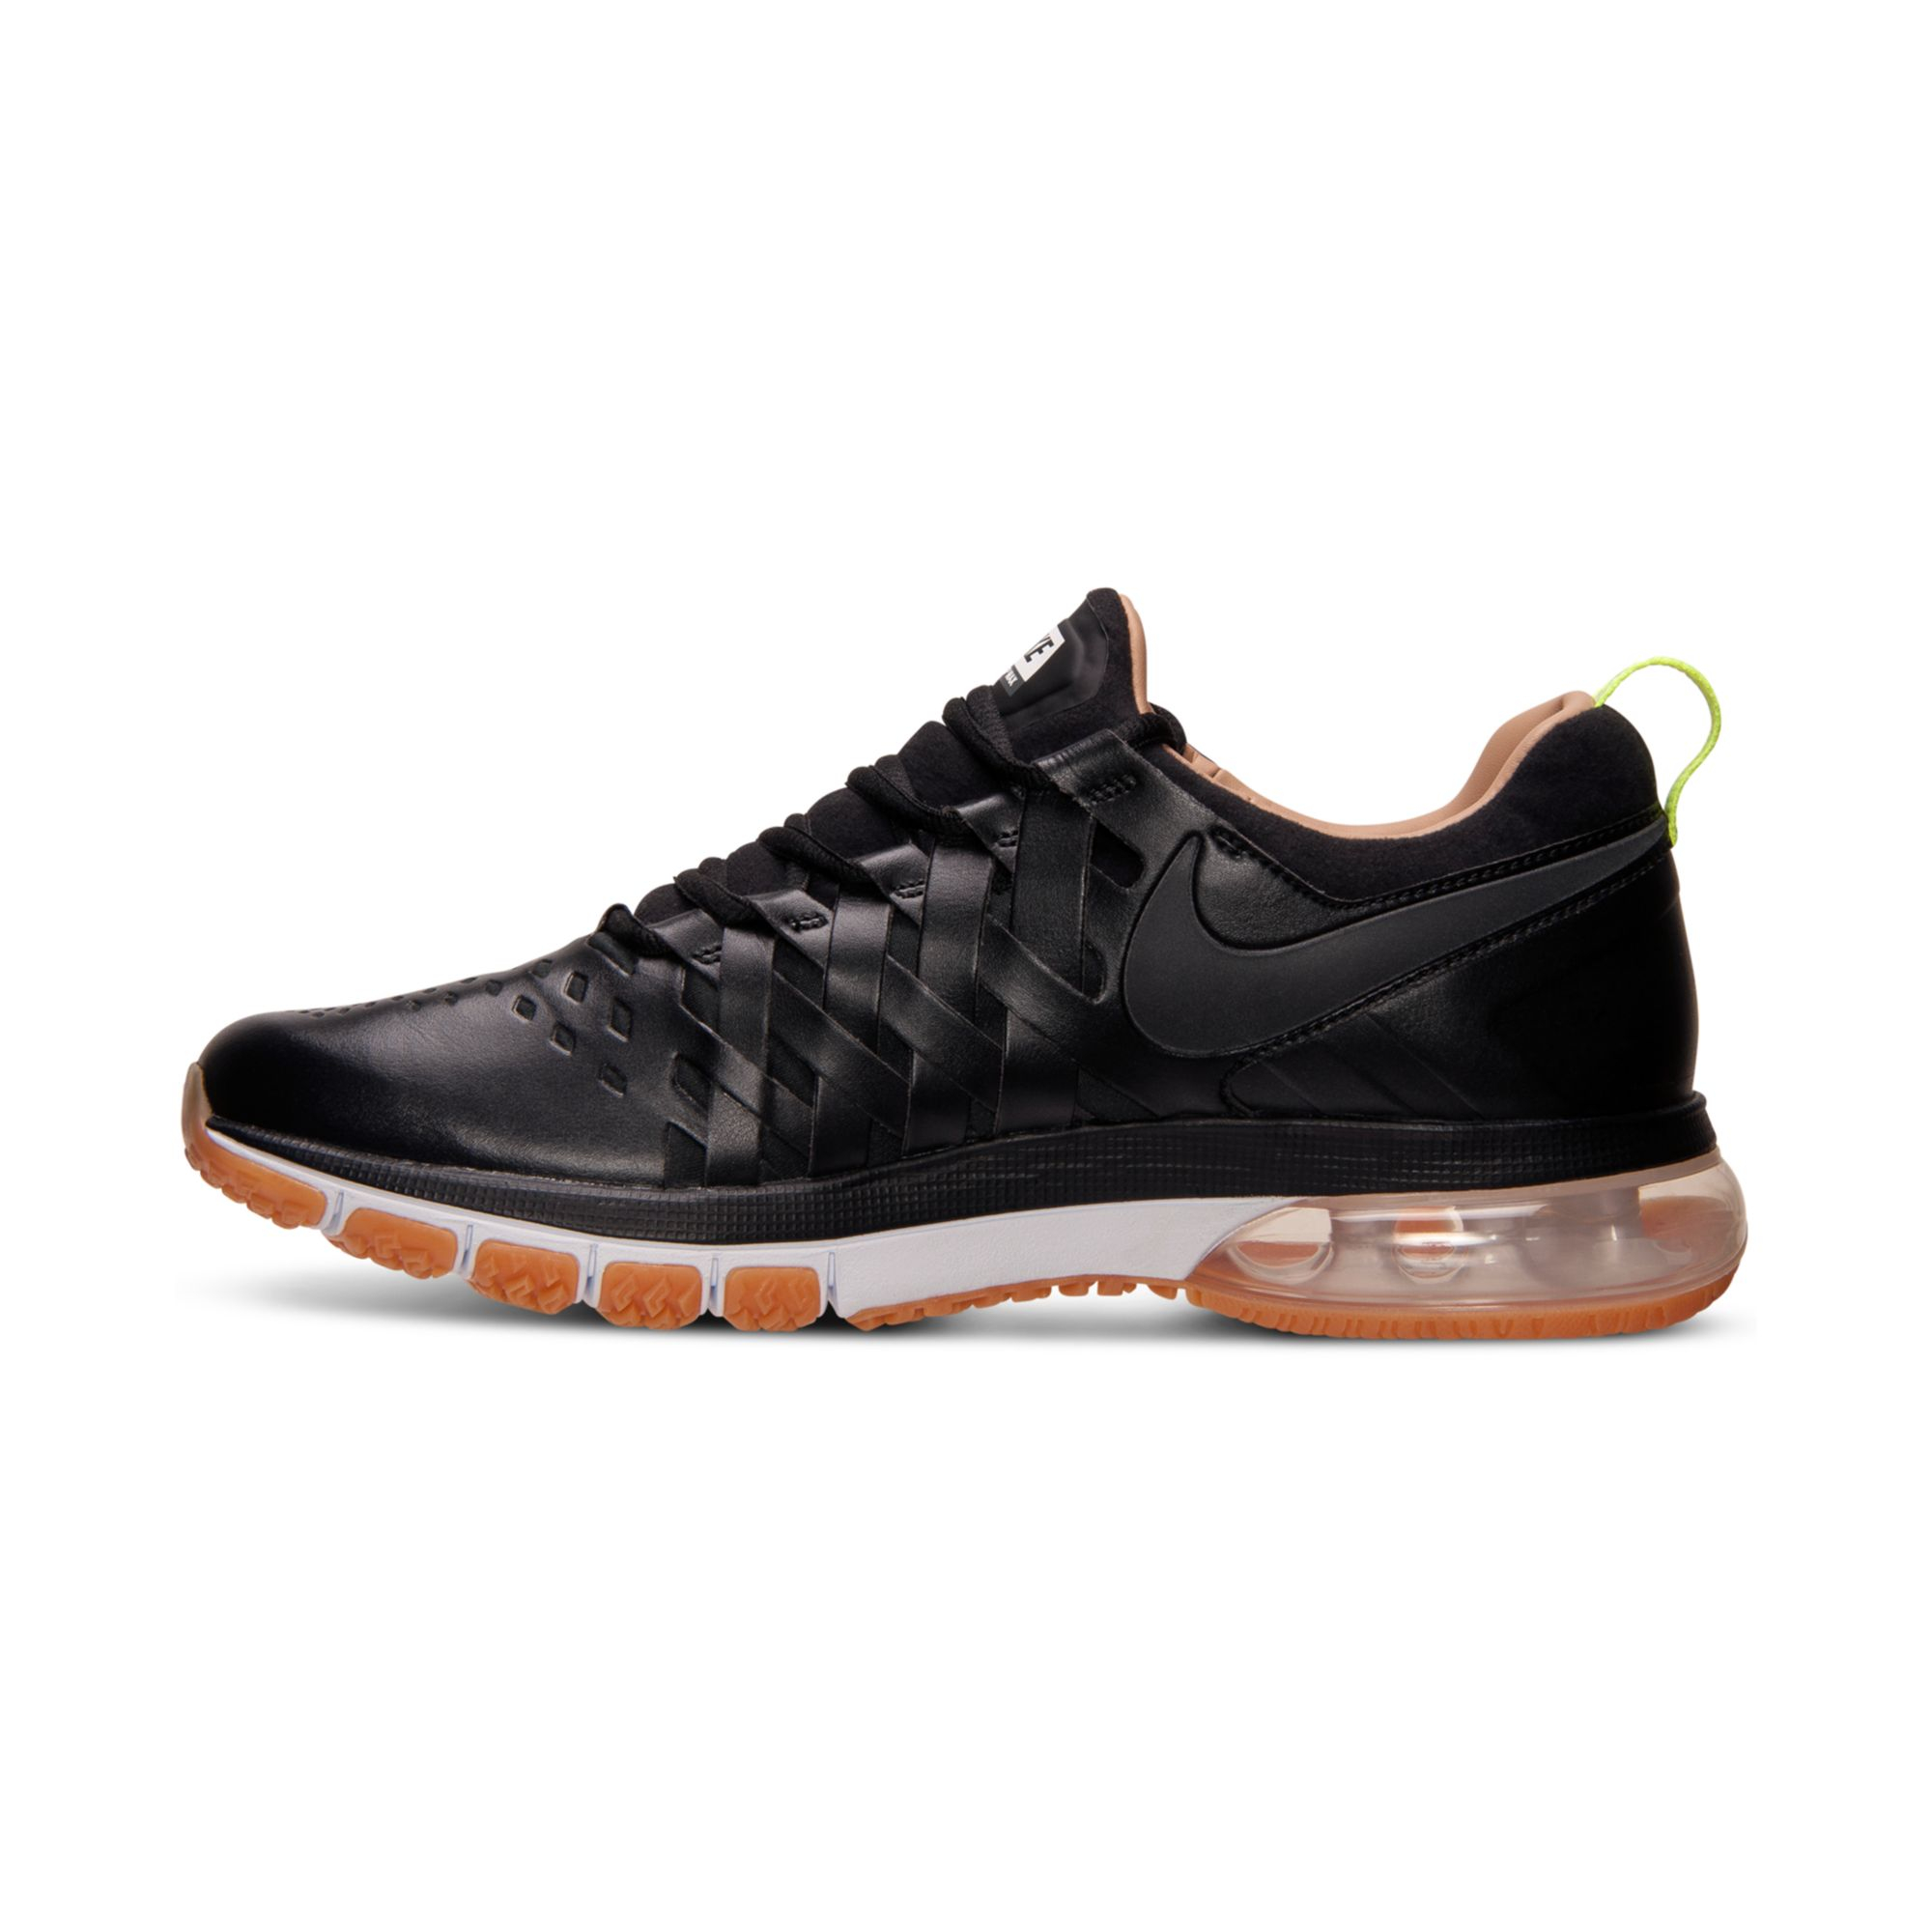 nike men 39 s fingertrap air max premium training sneakers. Black Bedroom Furniture Sets. Home Design Ideas